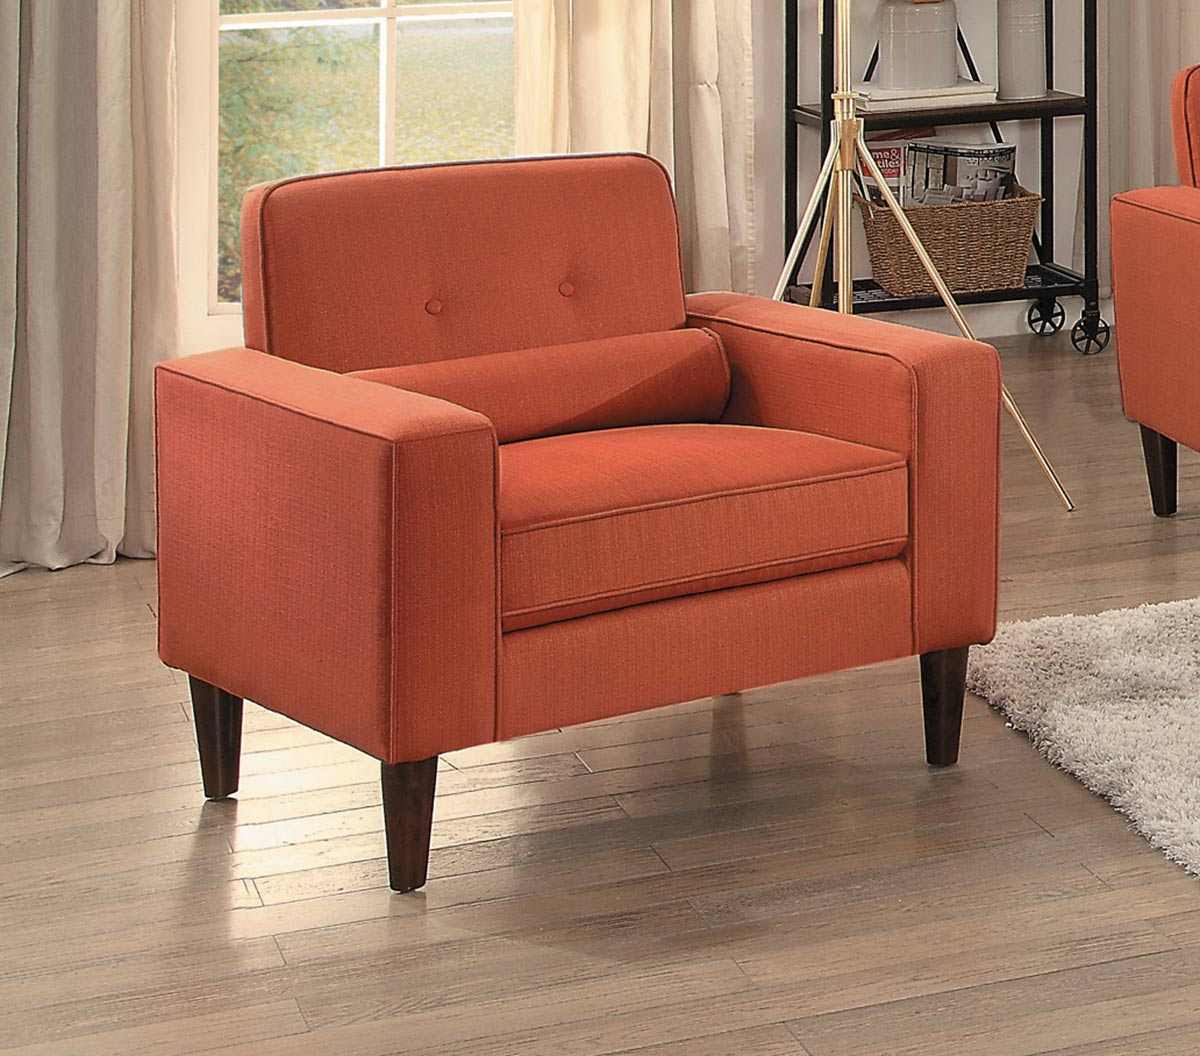 Homelegance Corso Chair - Orange